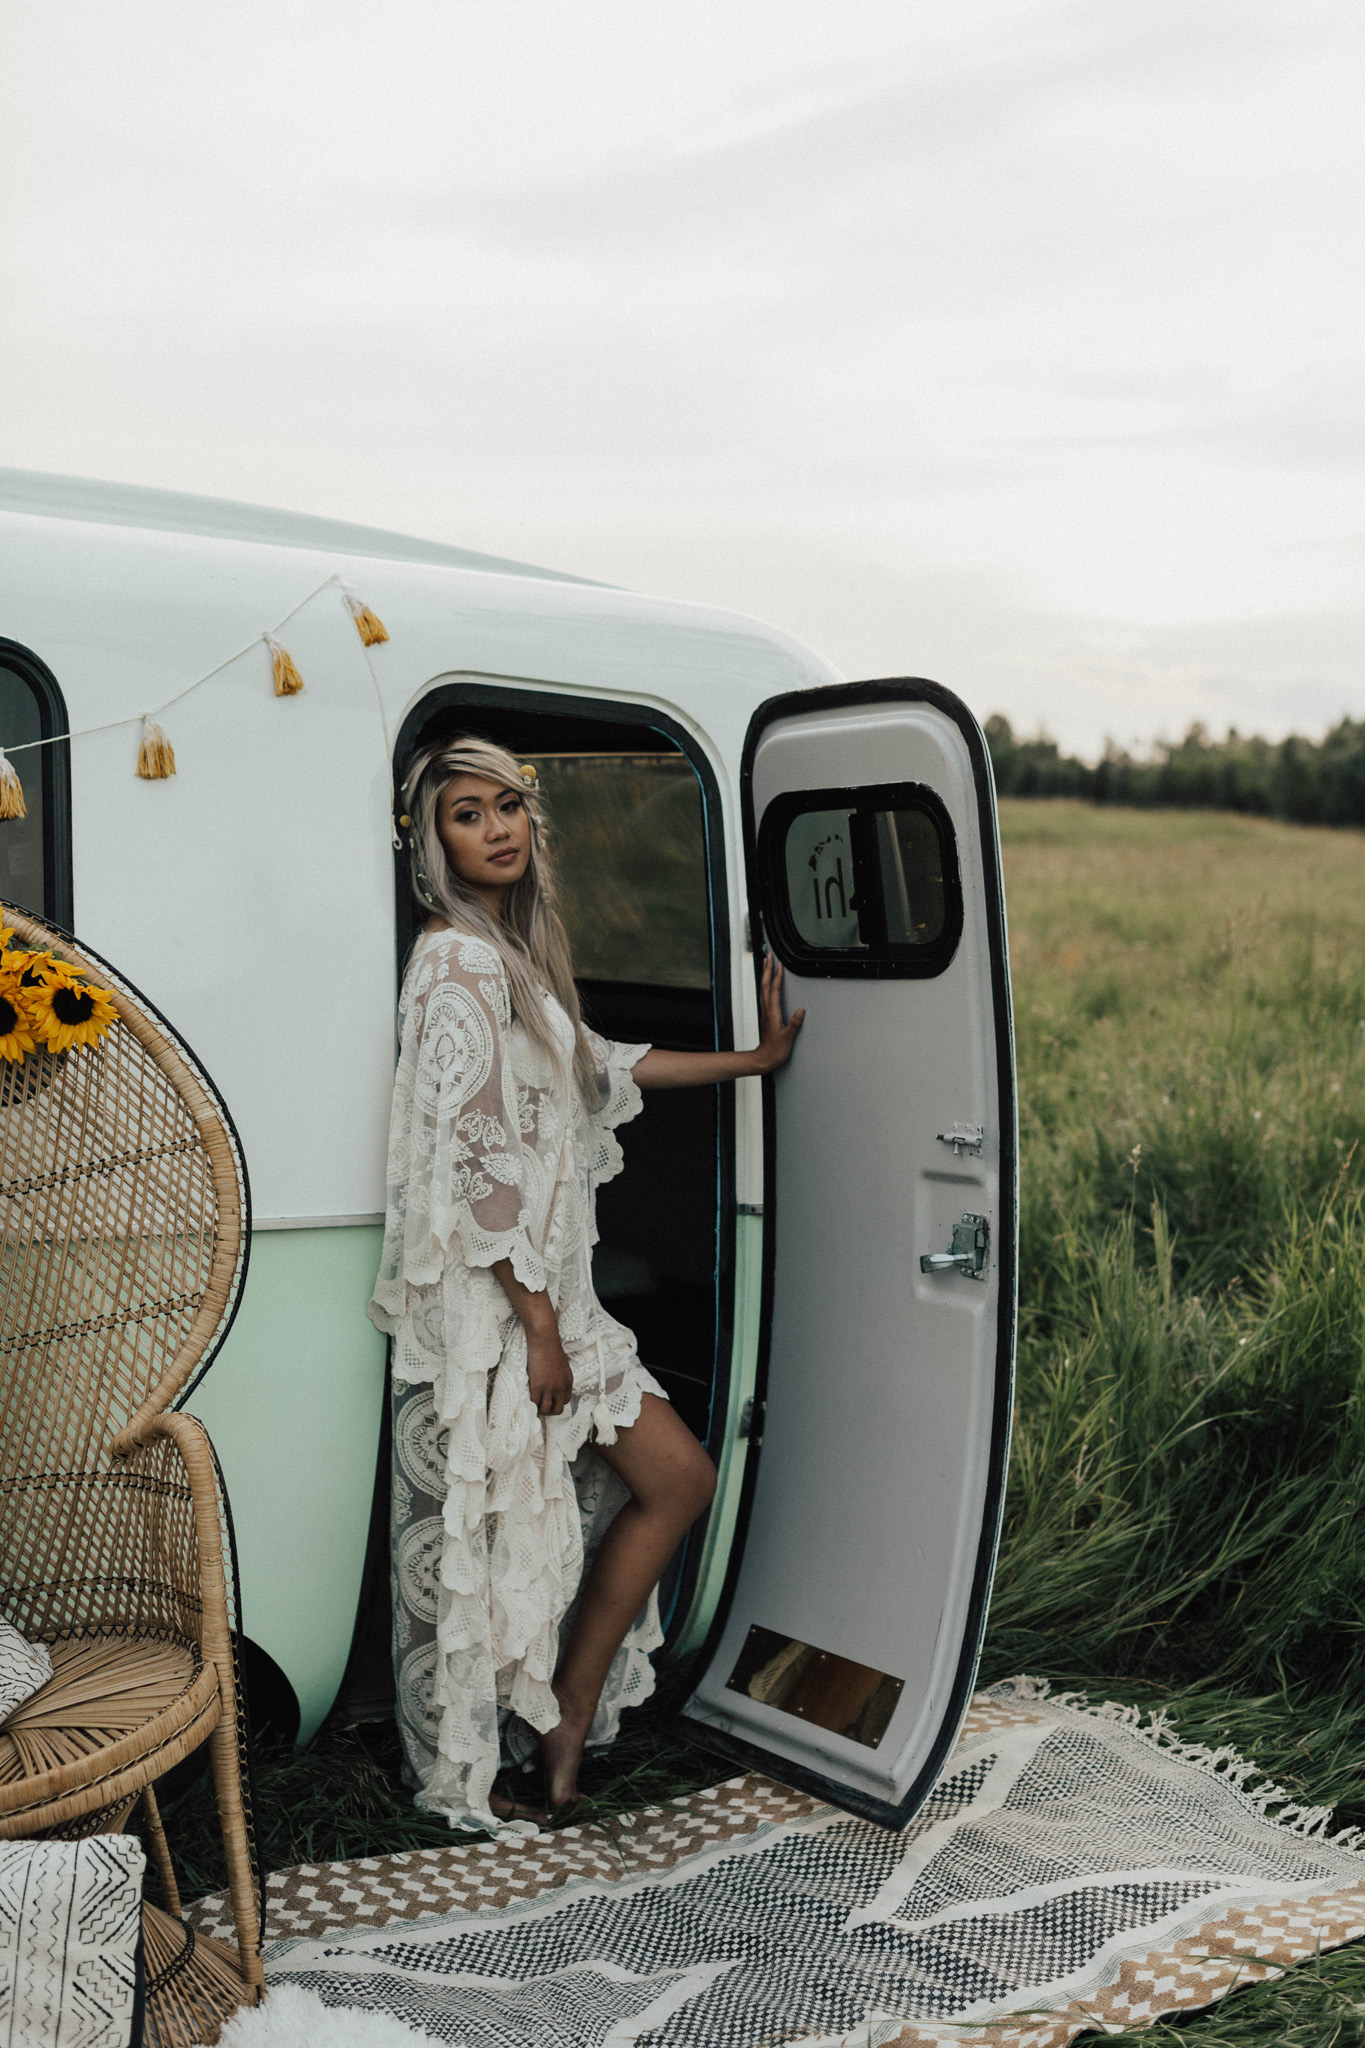 gypsy boler boudoir session - michelle larmand 031